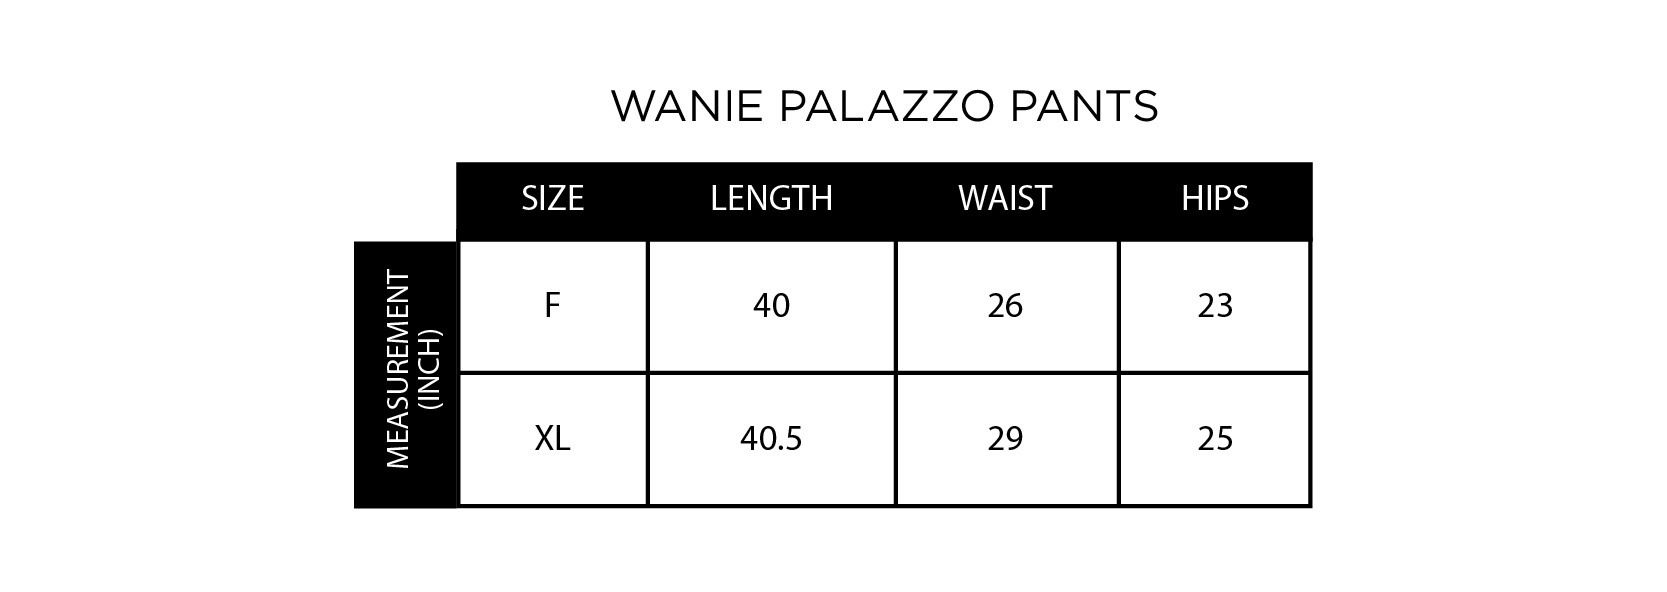 Wanie Palazzo Size Chart